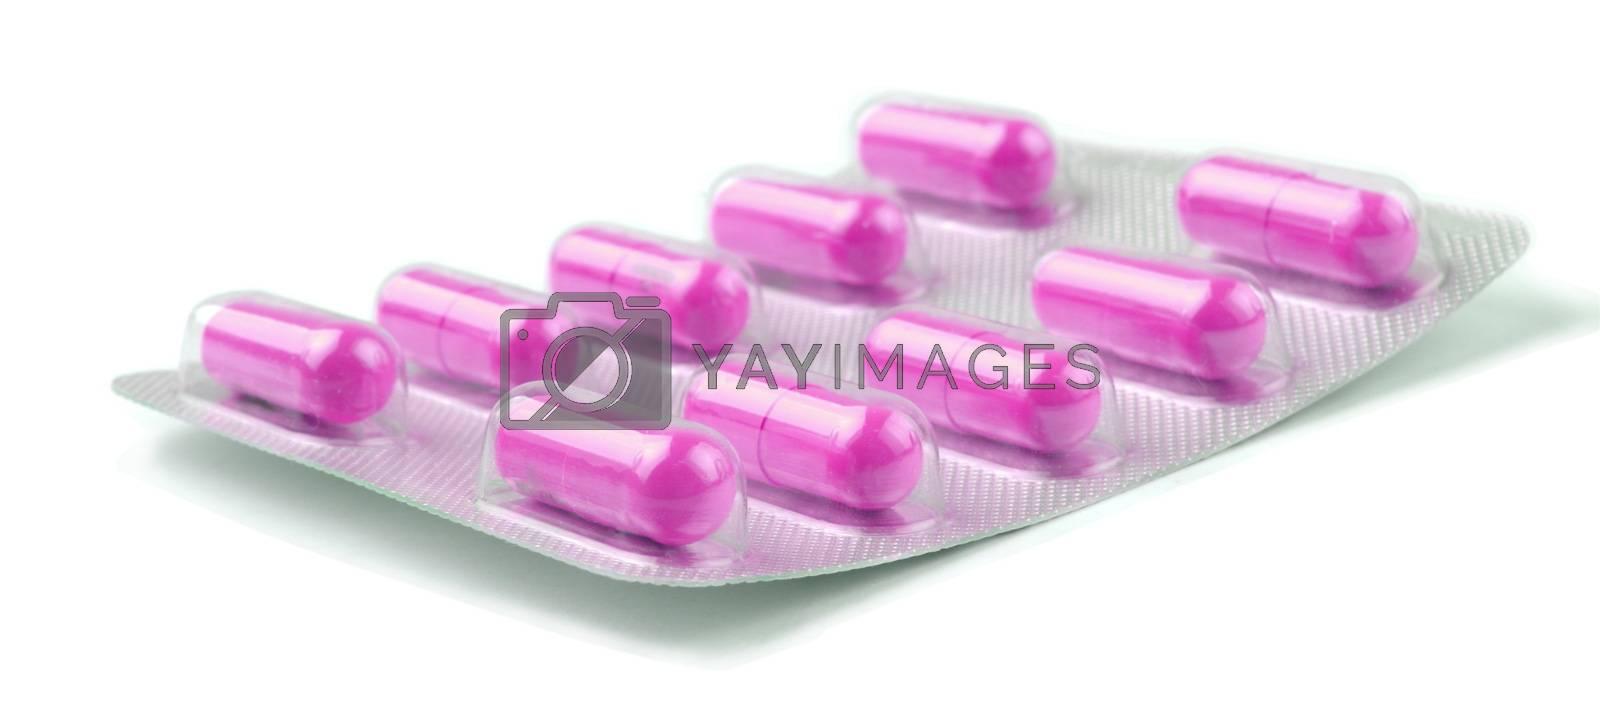 pink  medicine pills over white